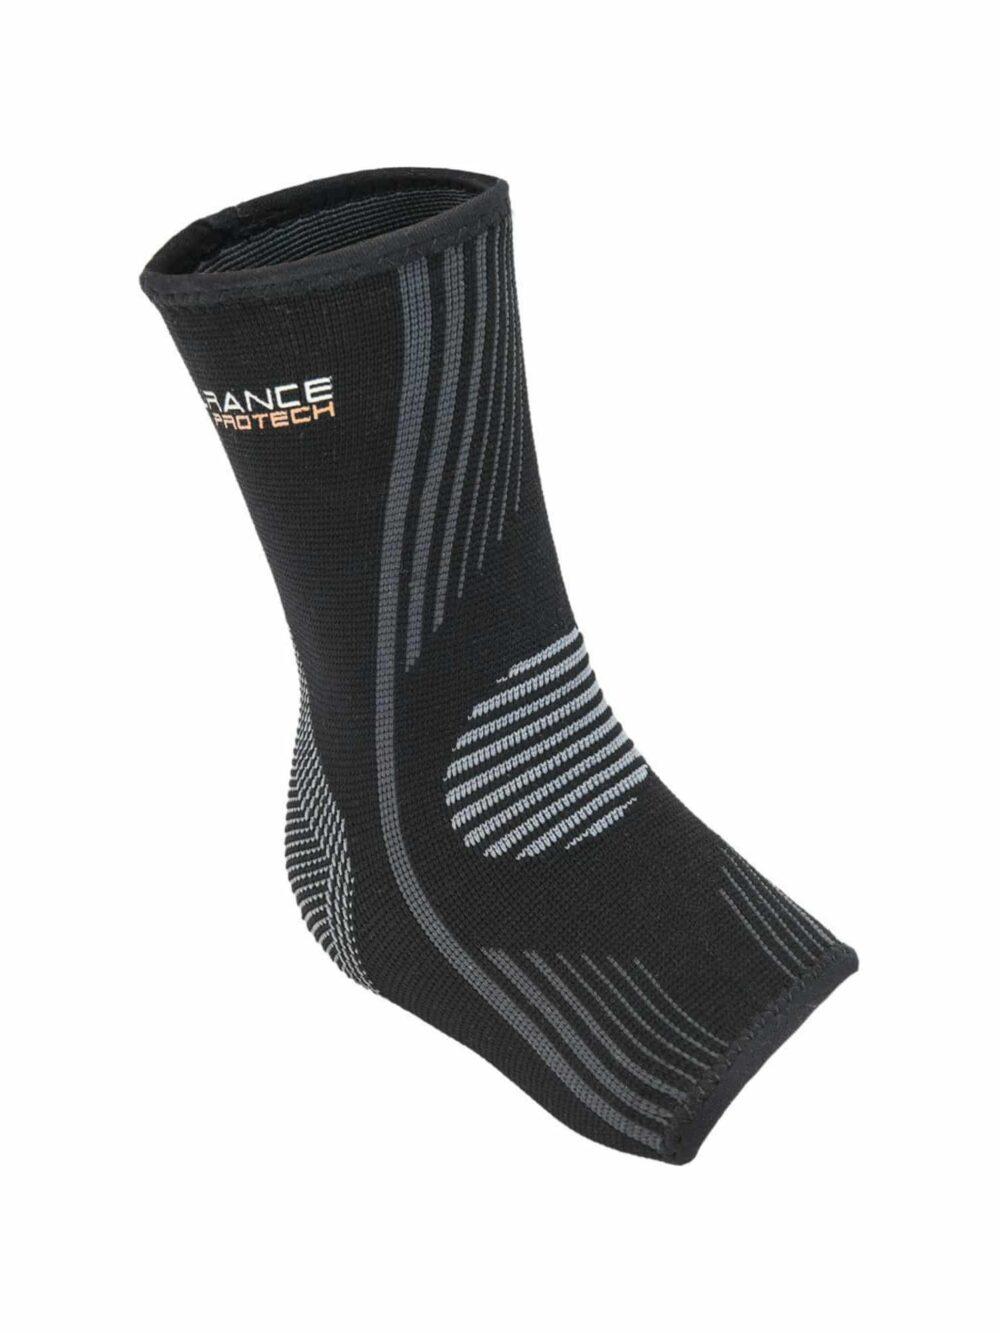 Endurance Protech Ankle Compression